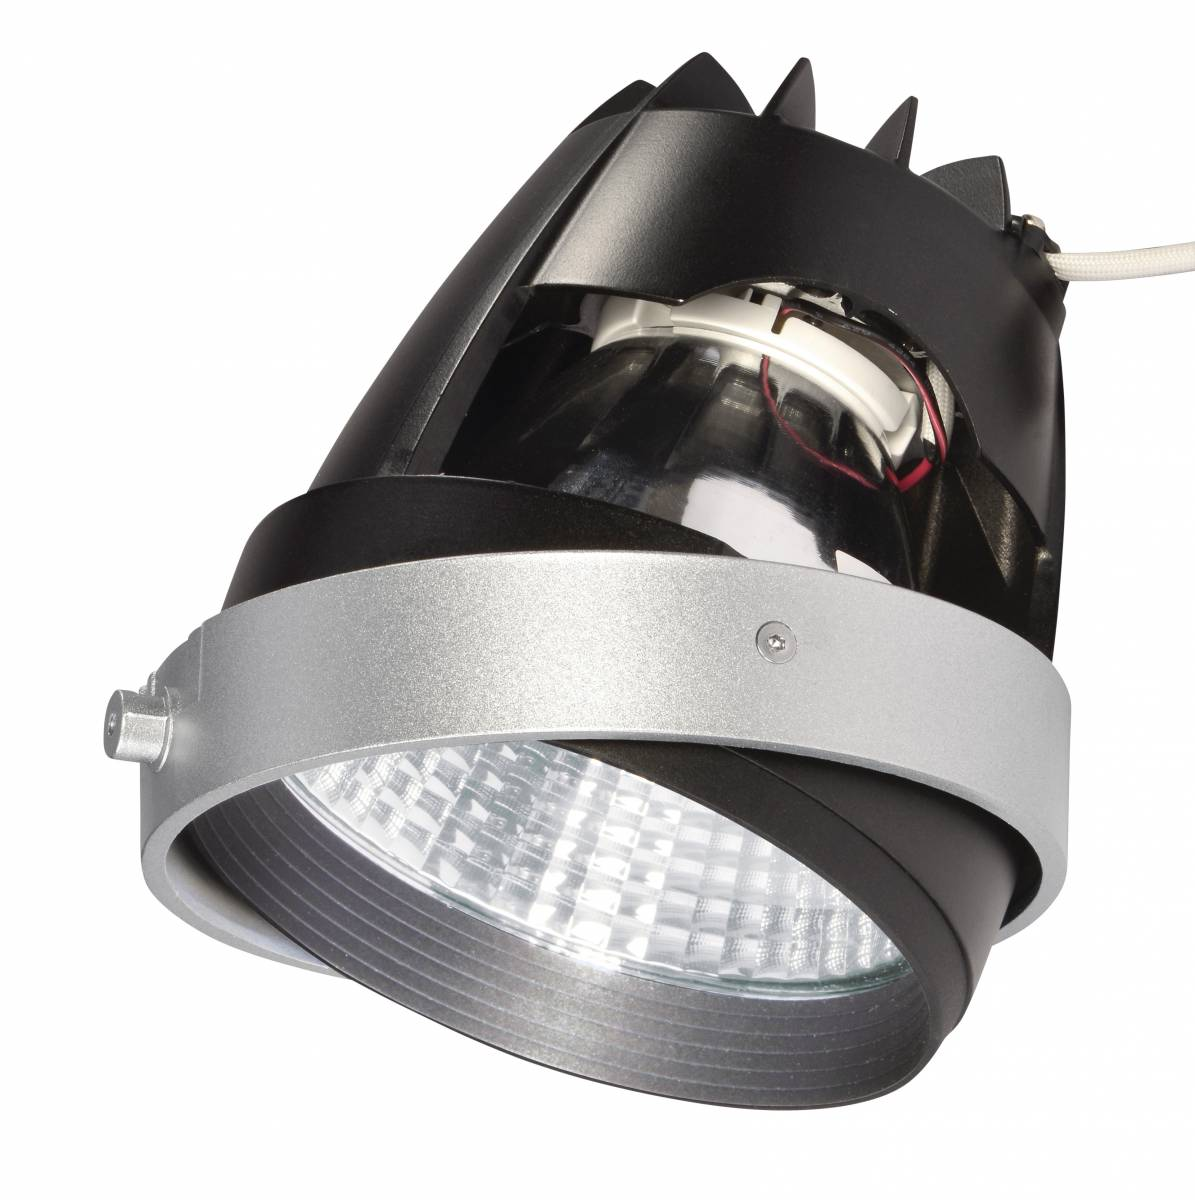 COB LED MODULE, silver-grey, 70°, CRI90+, 4200K